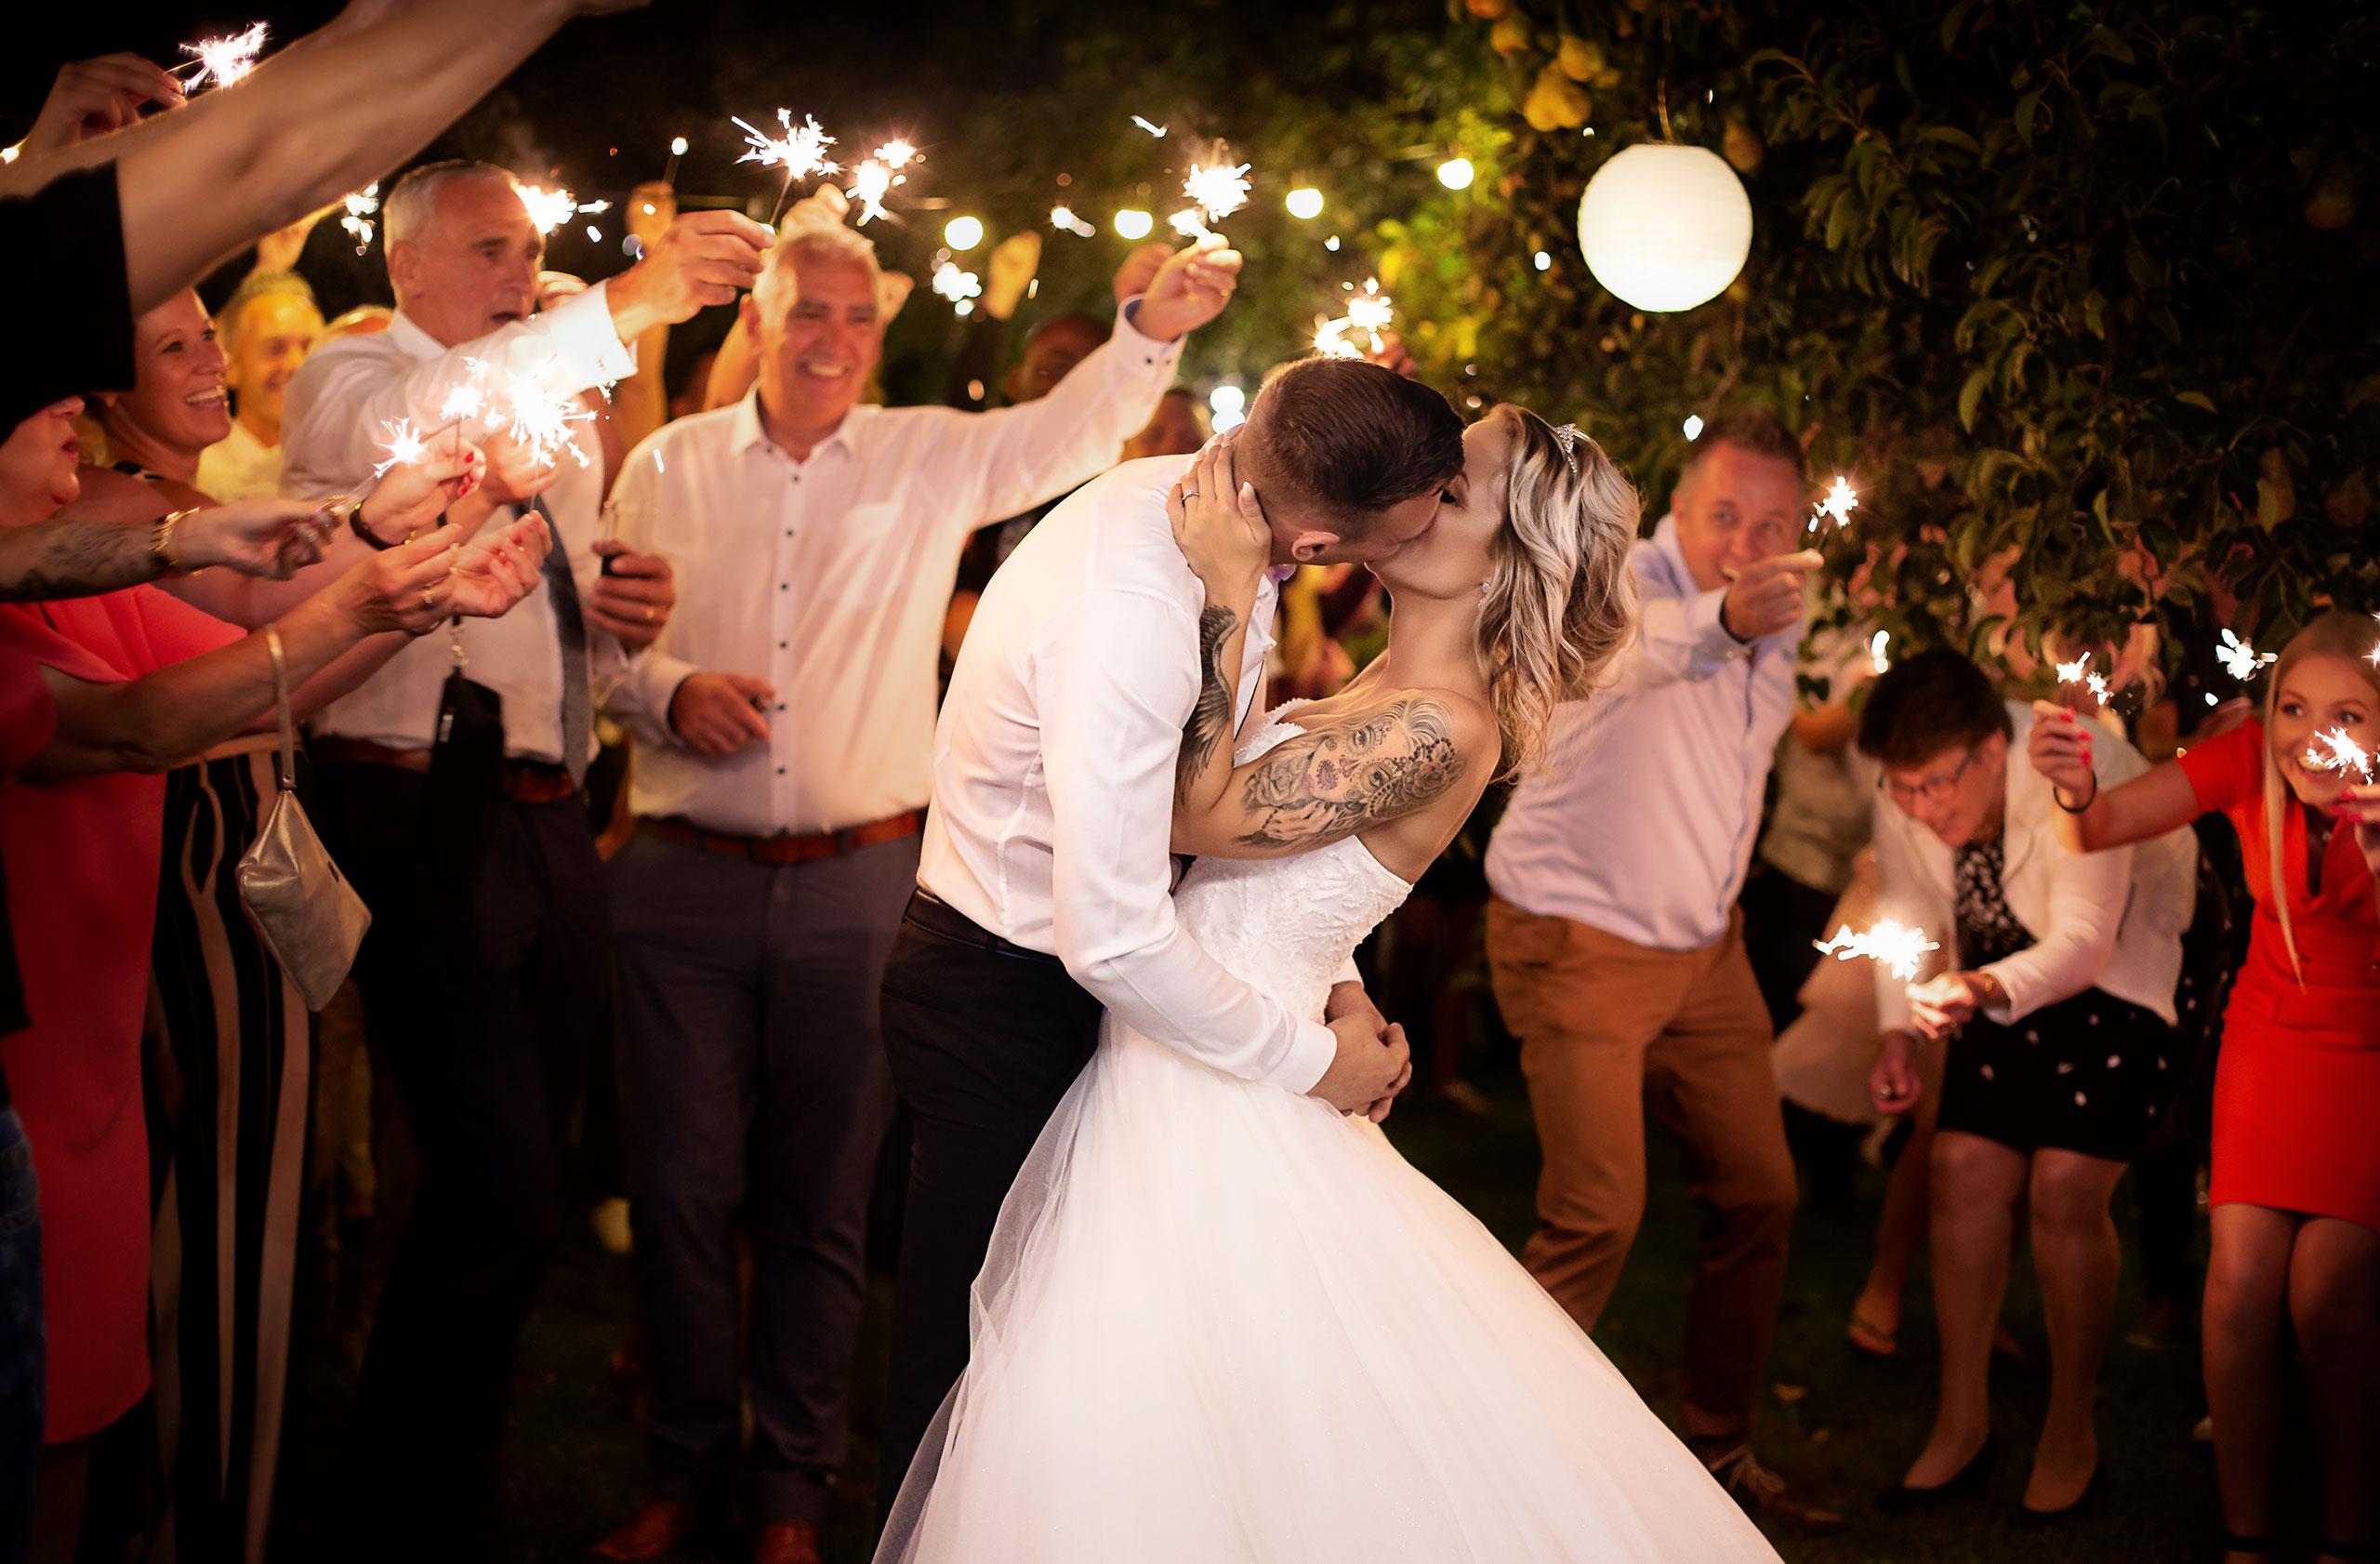 Hoe krijg je de perfecte trouwfoto's